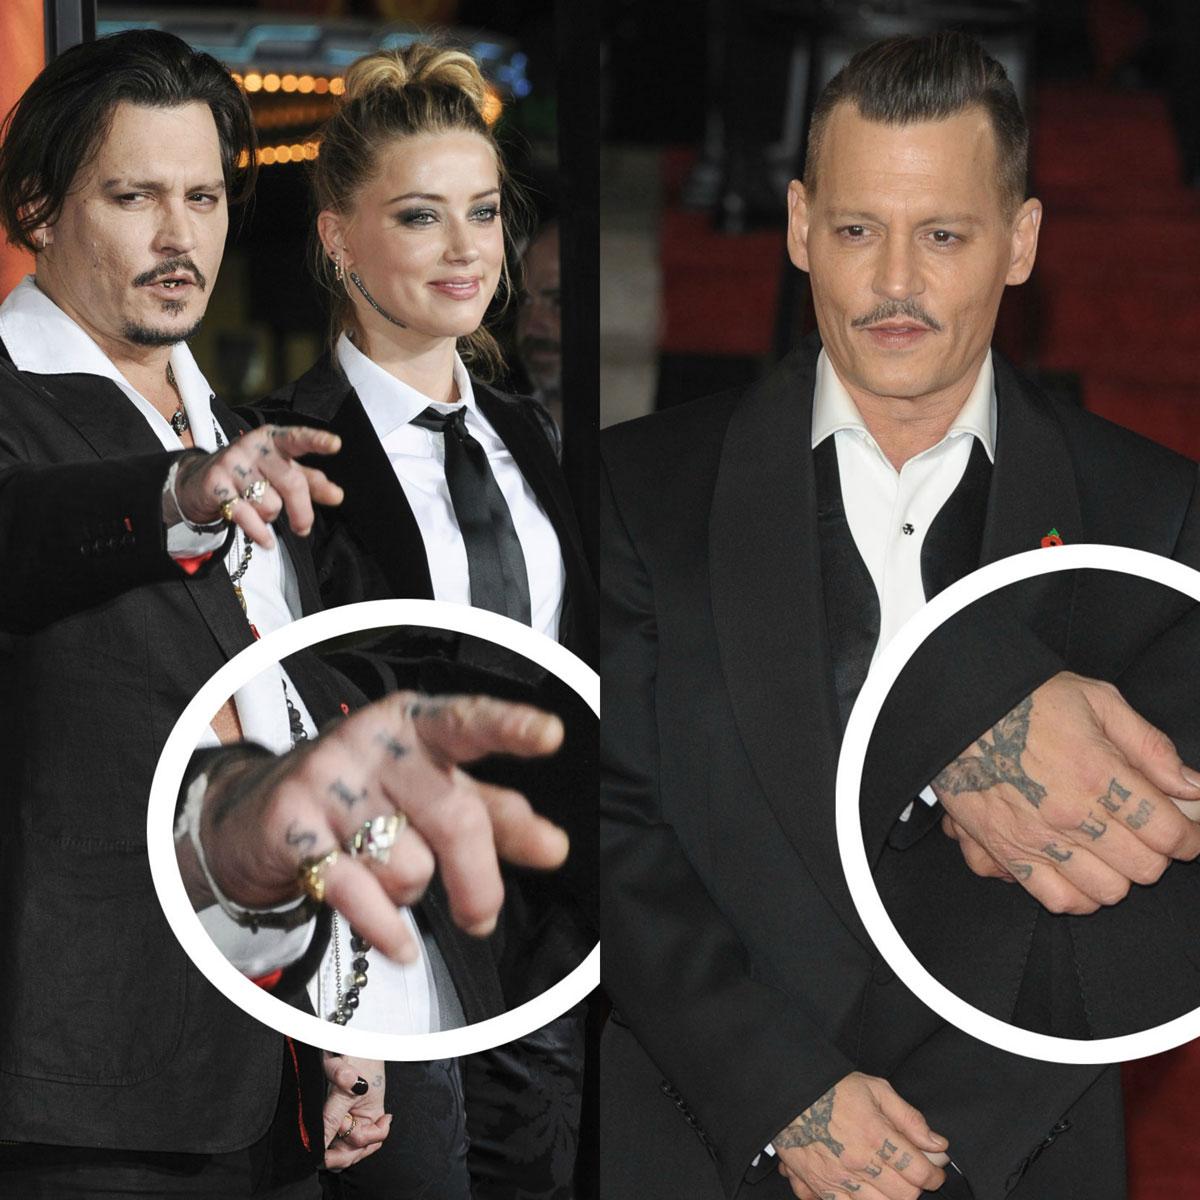 Johnny Depp covers up Amber Heard tattoo